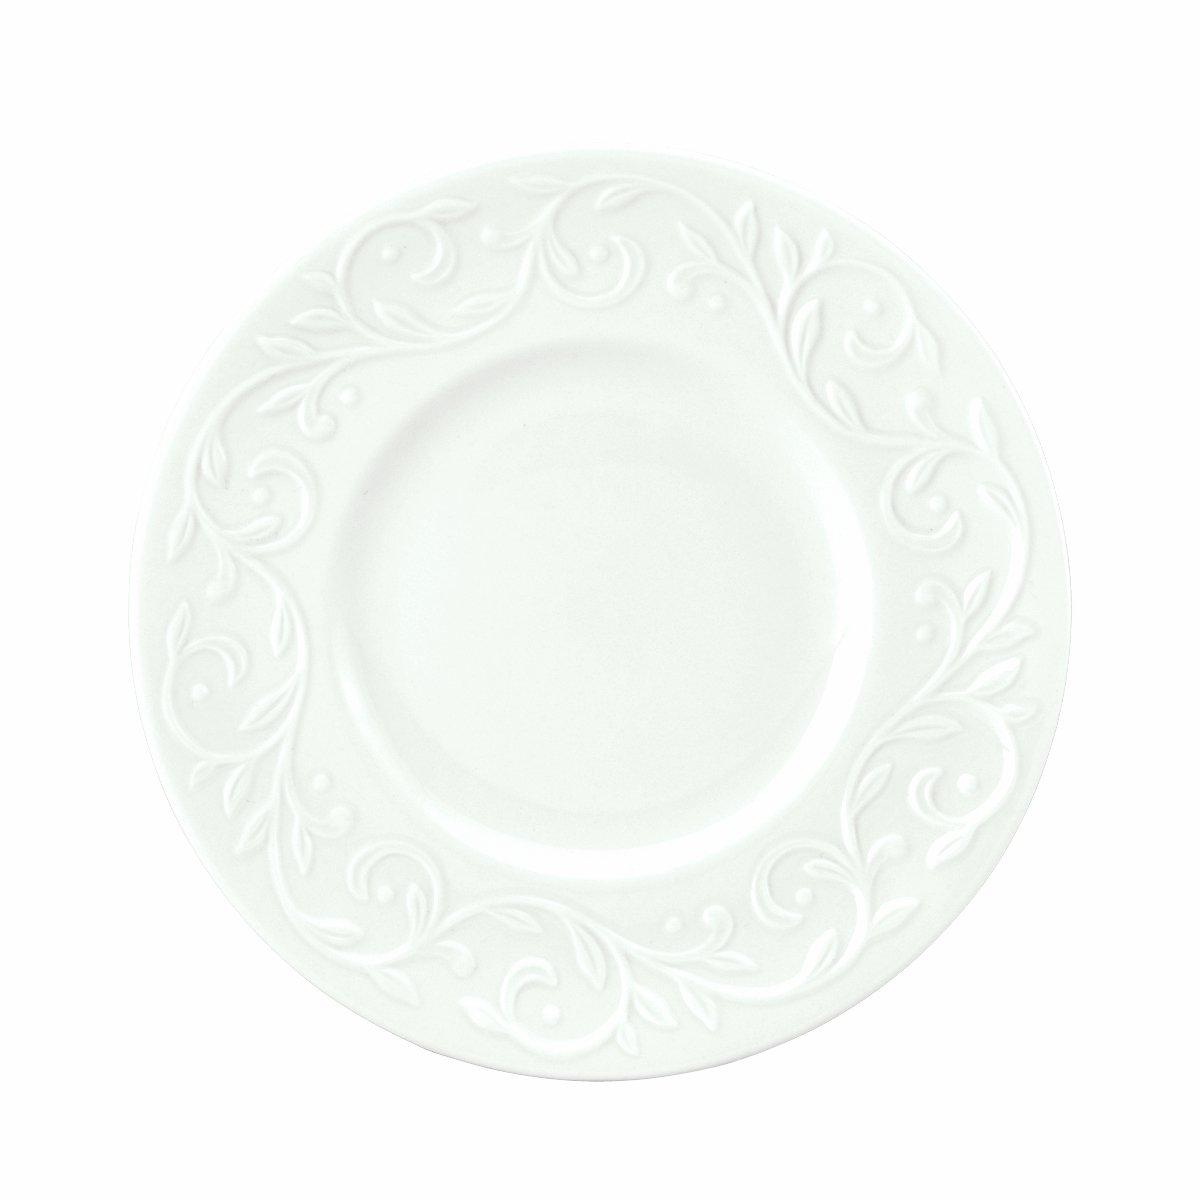 Lenox Opal Innocence Carved 7-1/4-Inch Dessert Plates, Set of 4